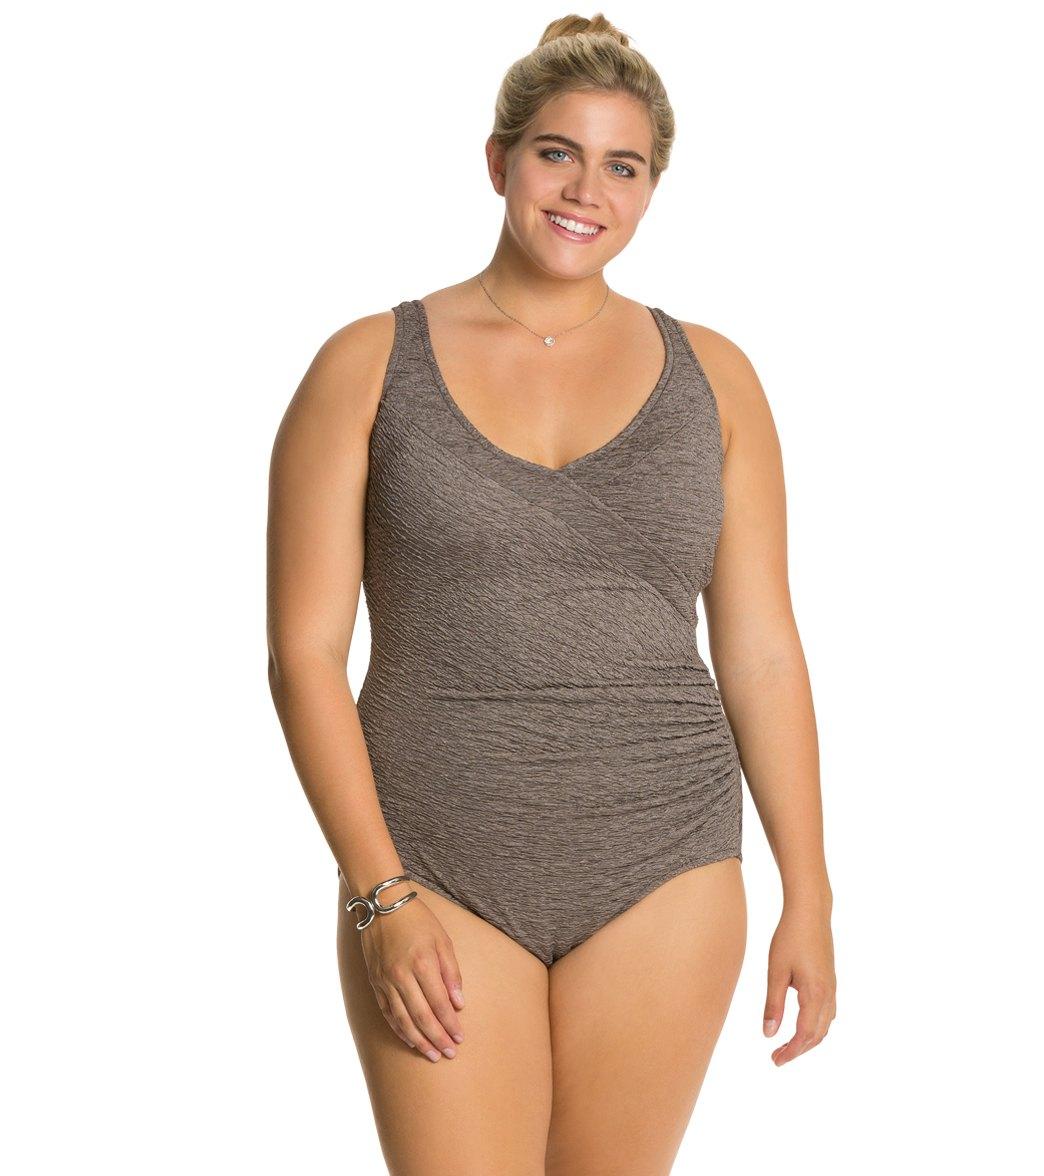 How to Choose Flattering Plus Size Swimwear